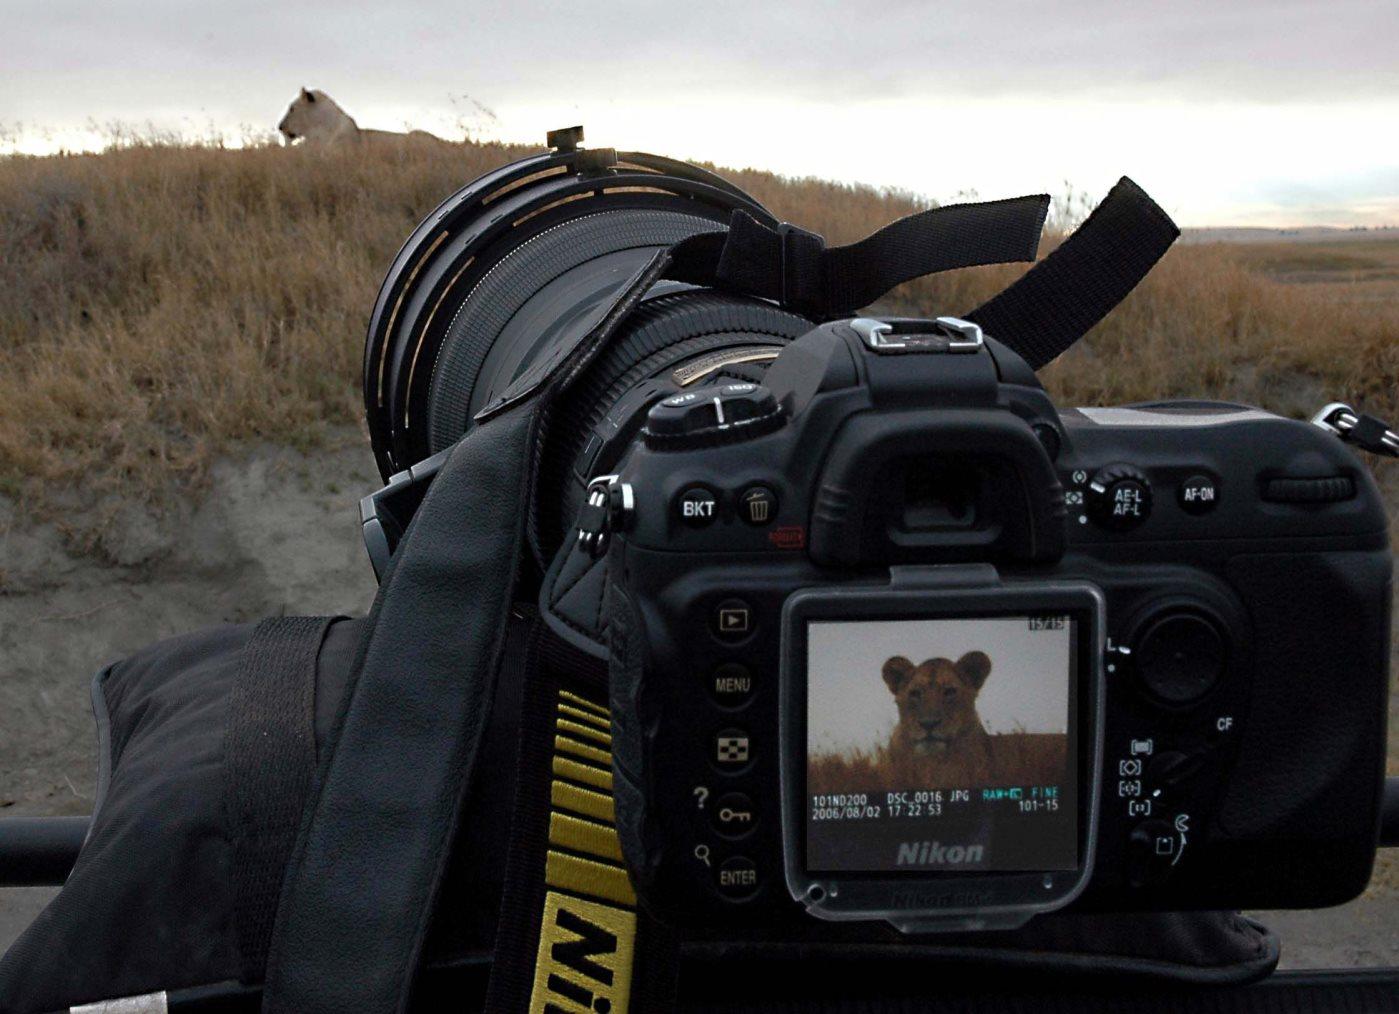 photographysafari 1 - Tips to Take Awesome Photos During a Safari